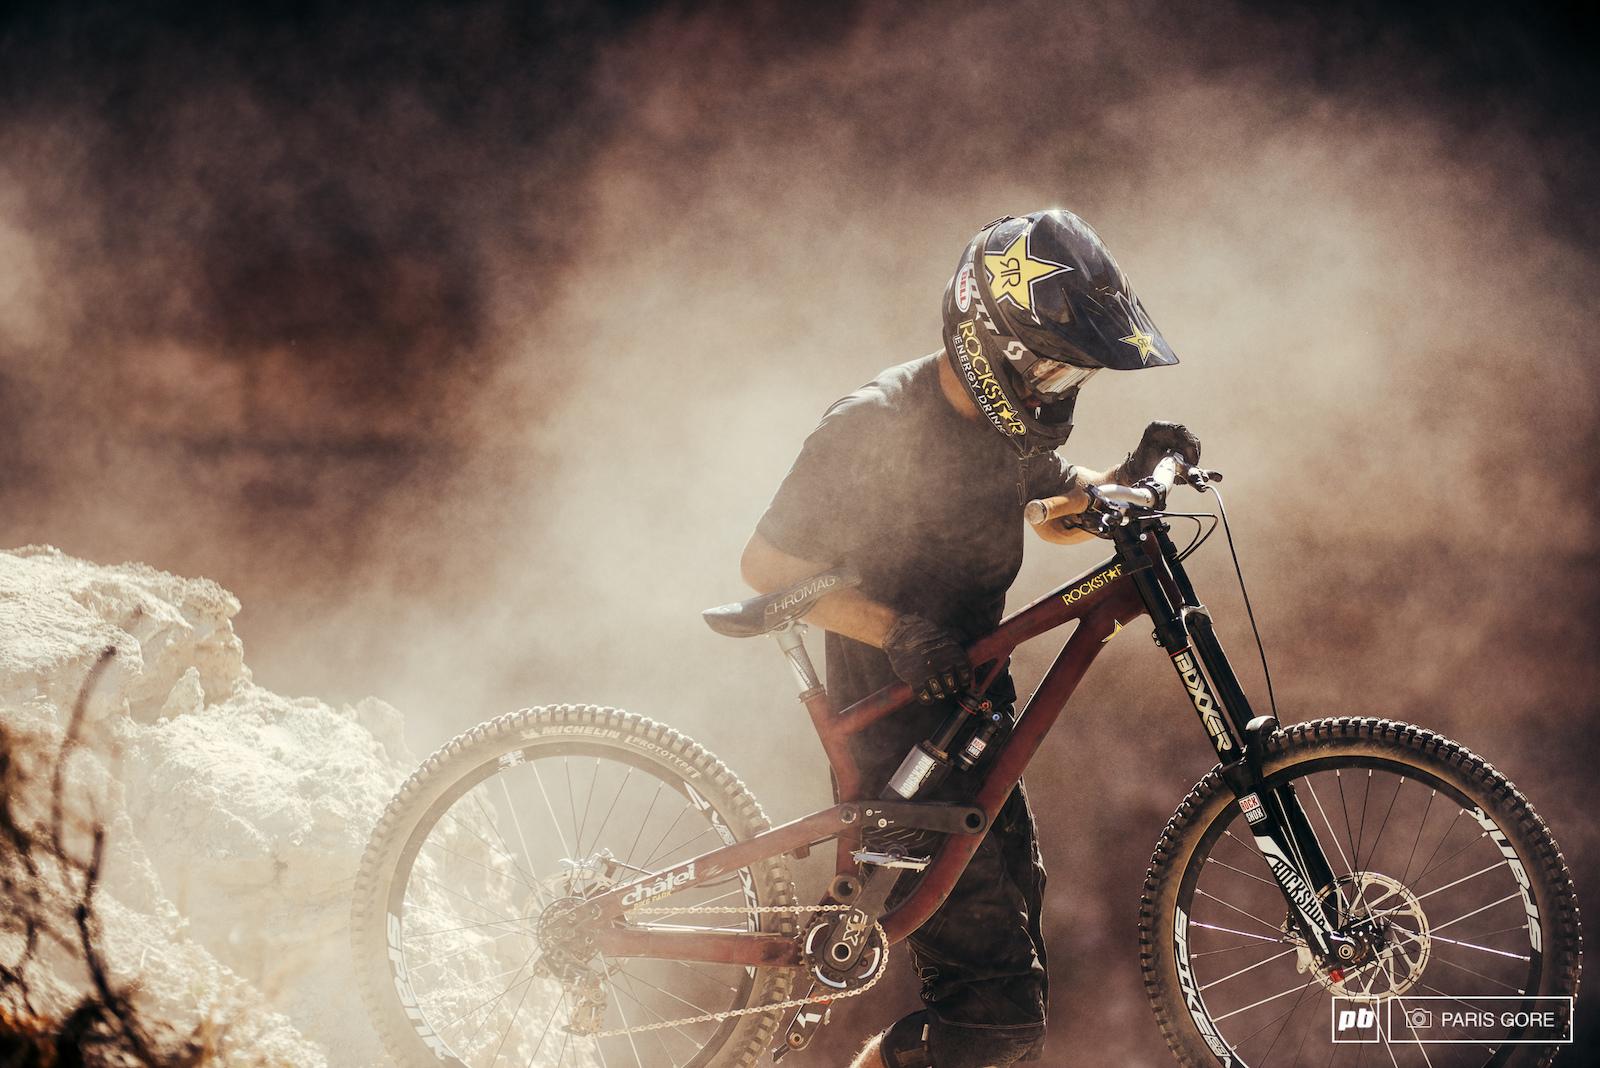 Dust storm trooper.